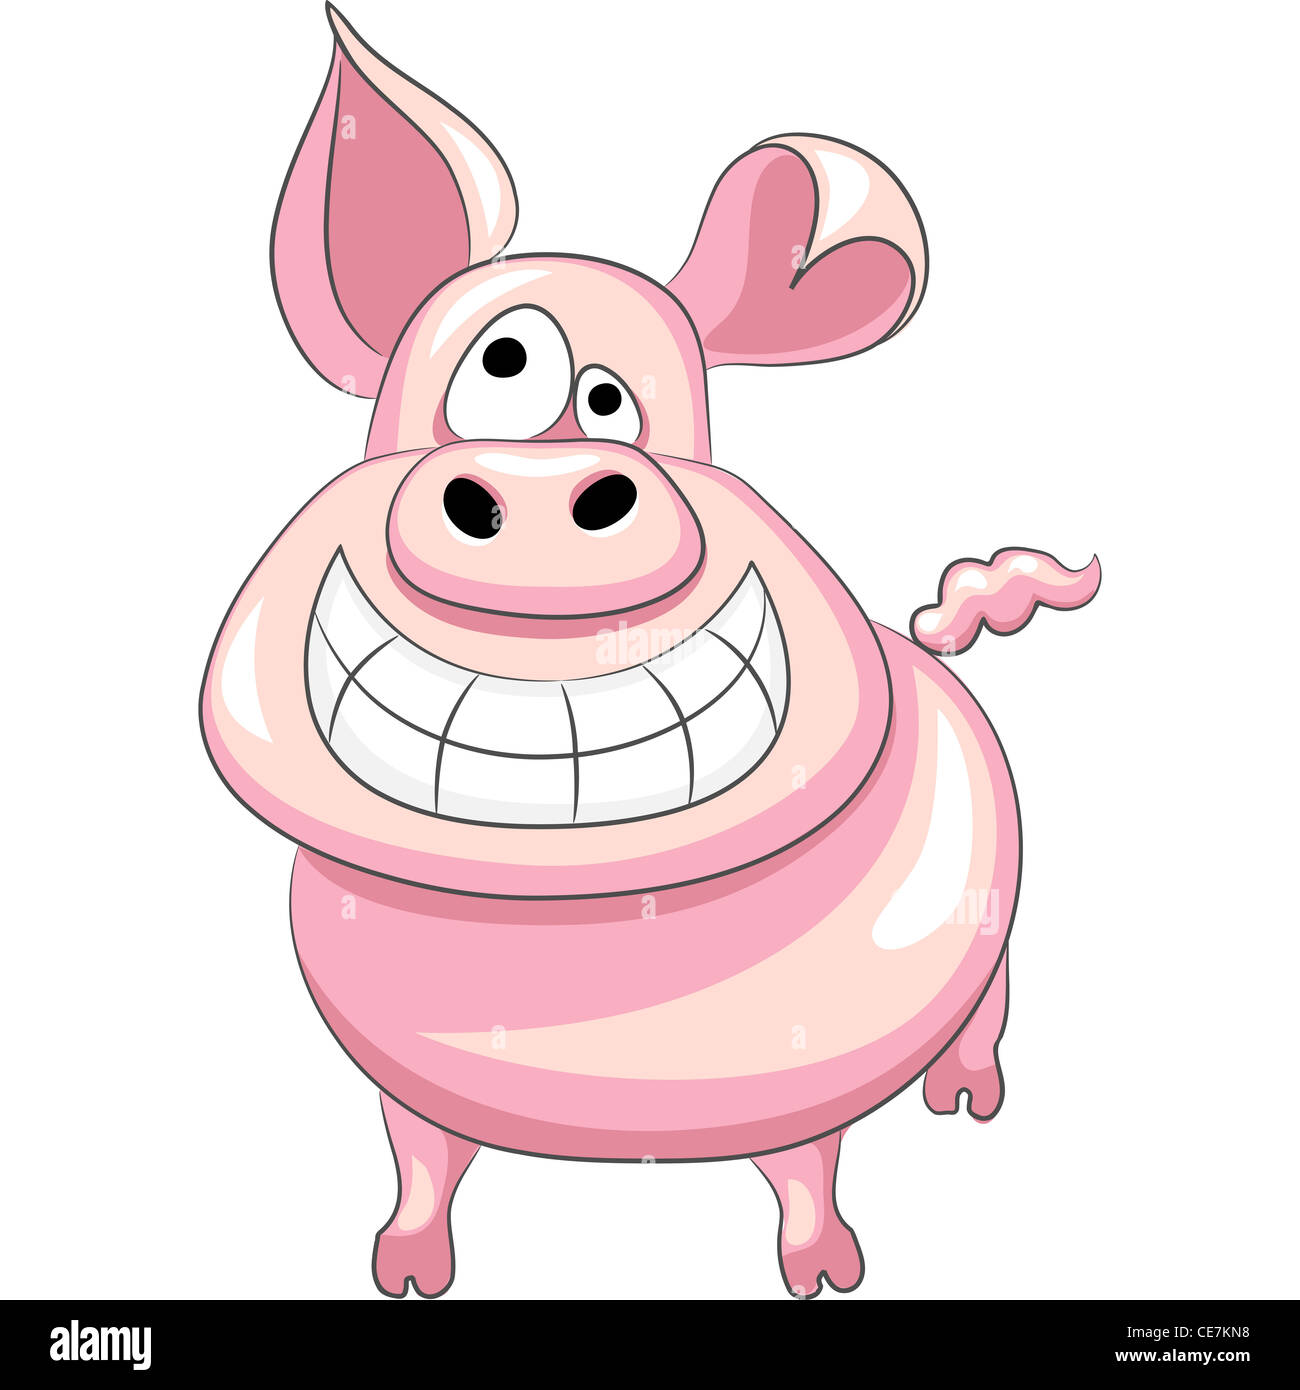 Divertida caricatura feliz sonrisa de cerdo Imagen De Stock